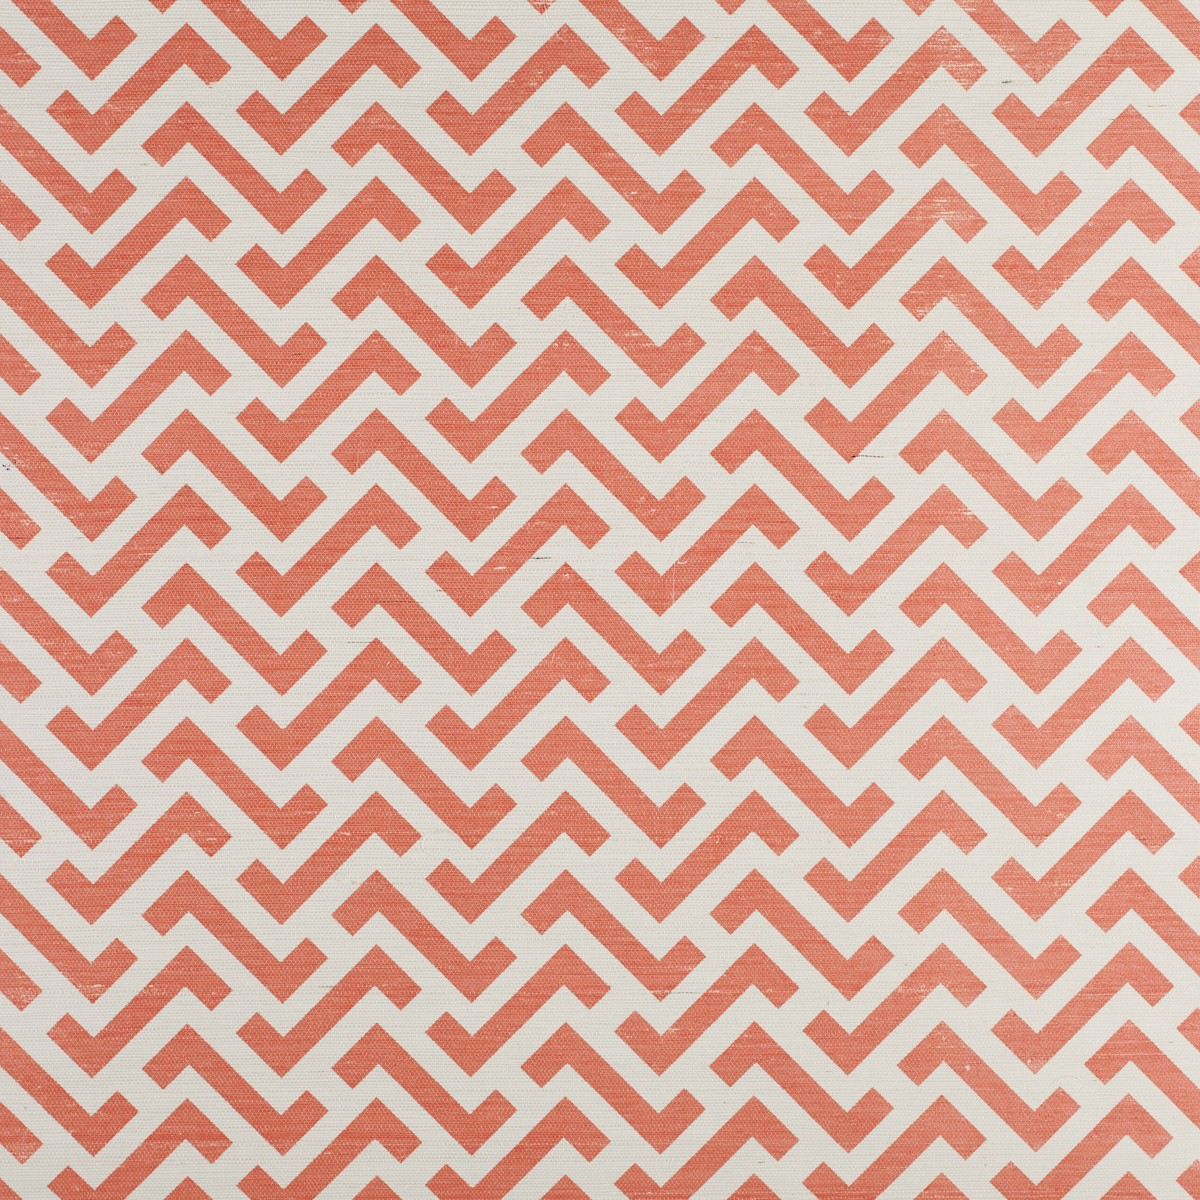 Block Zig Zag on Grasscoth  Salmon Pink Bernard Thorp Fabric and 1200x1200